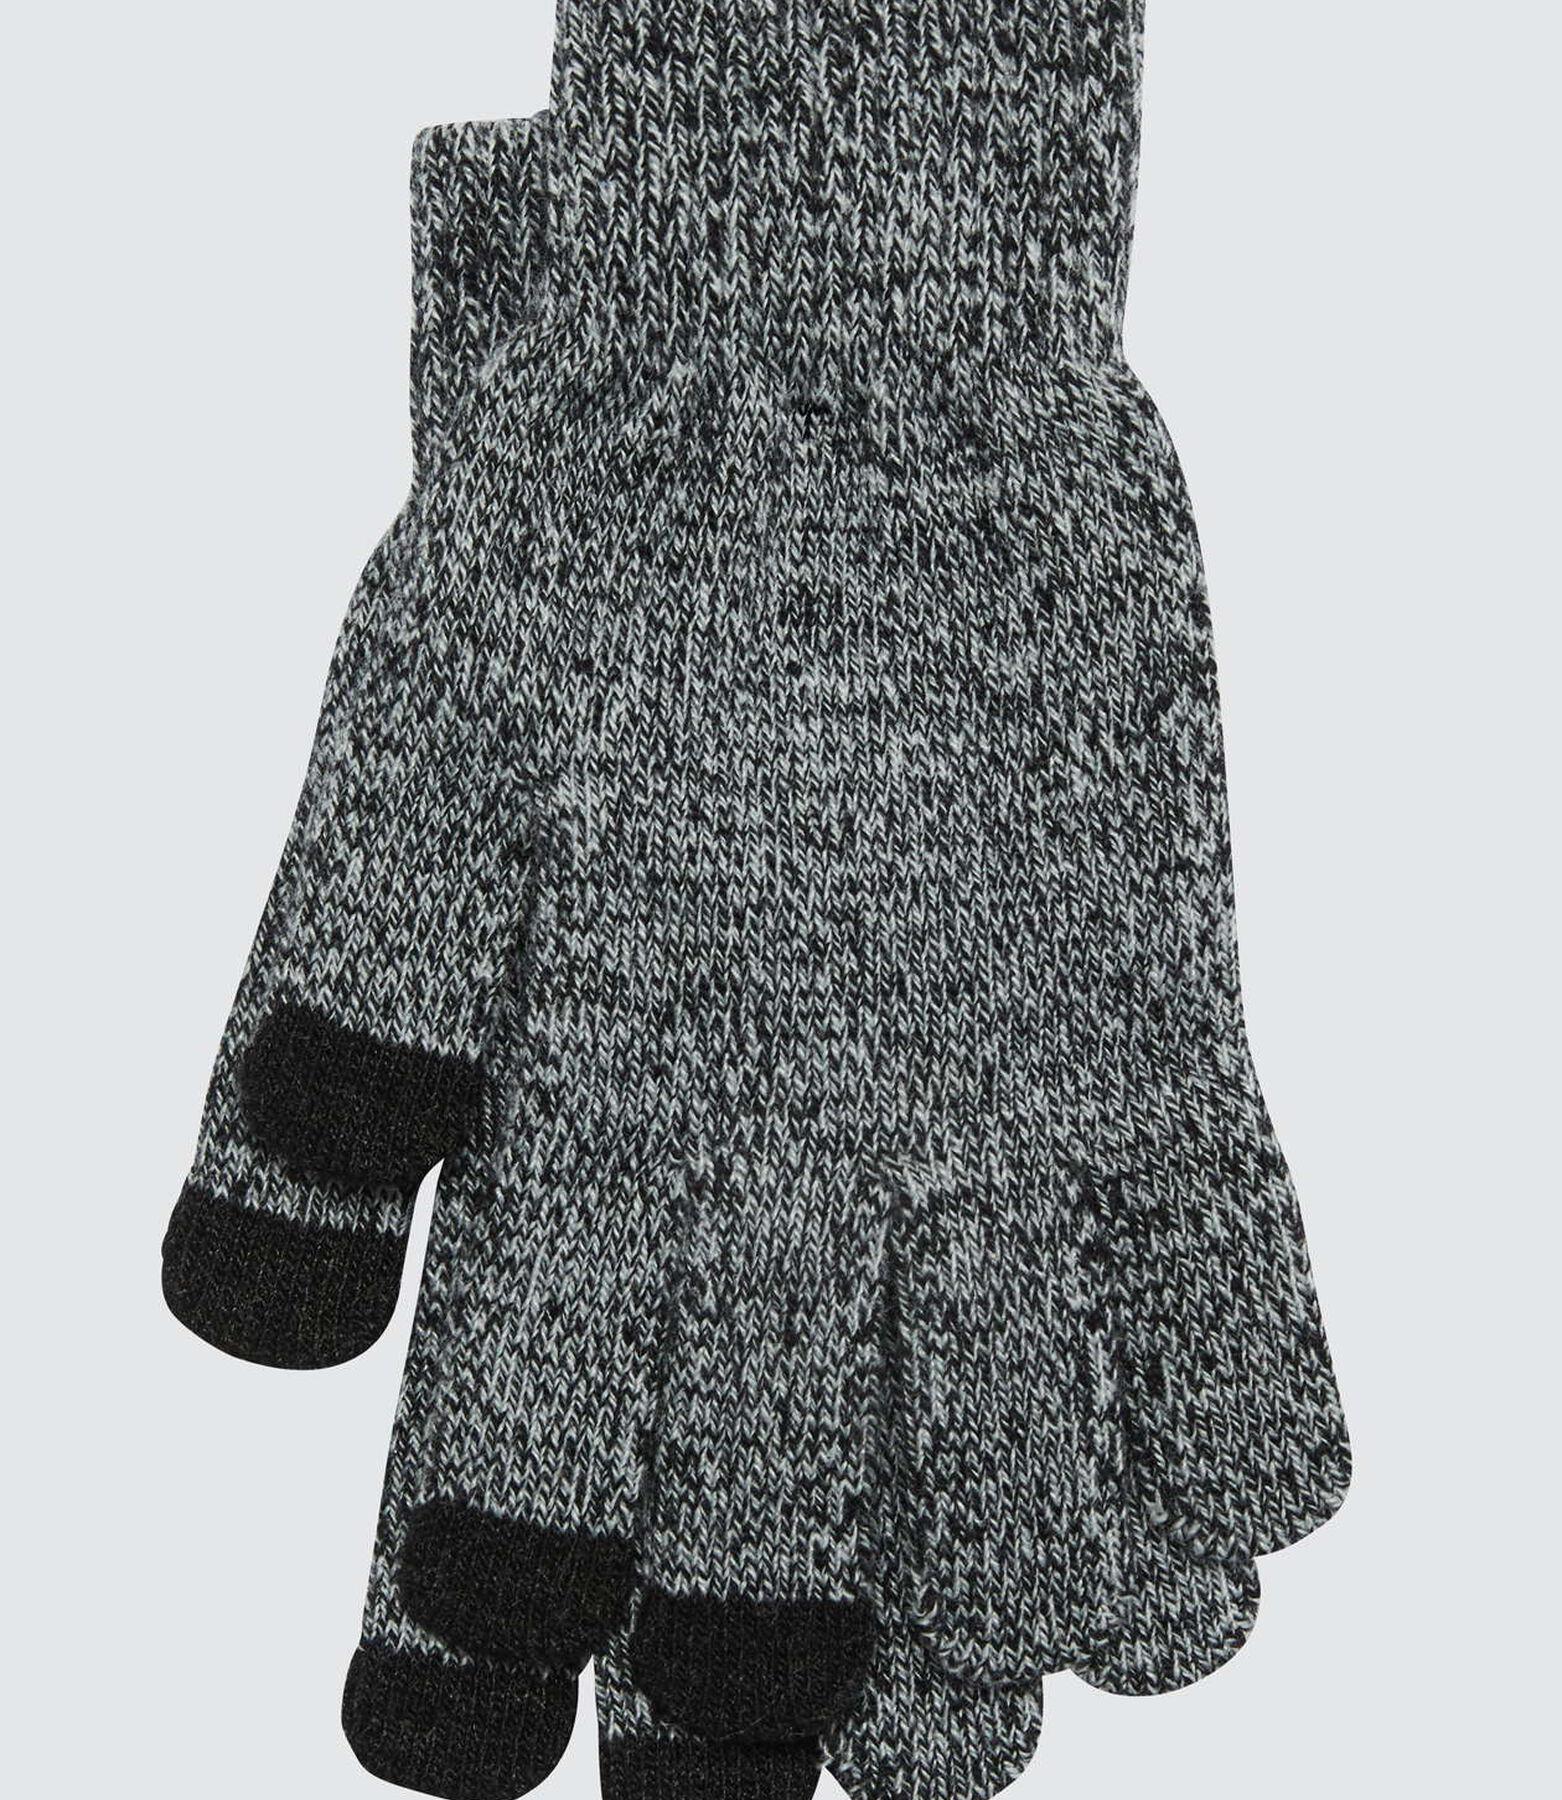 Gants en tricot tactiles